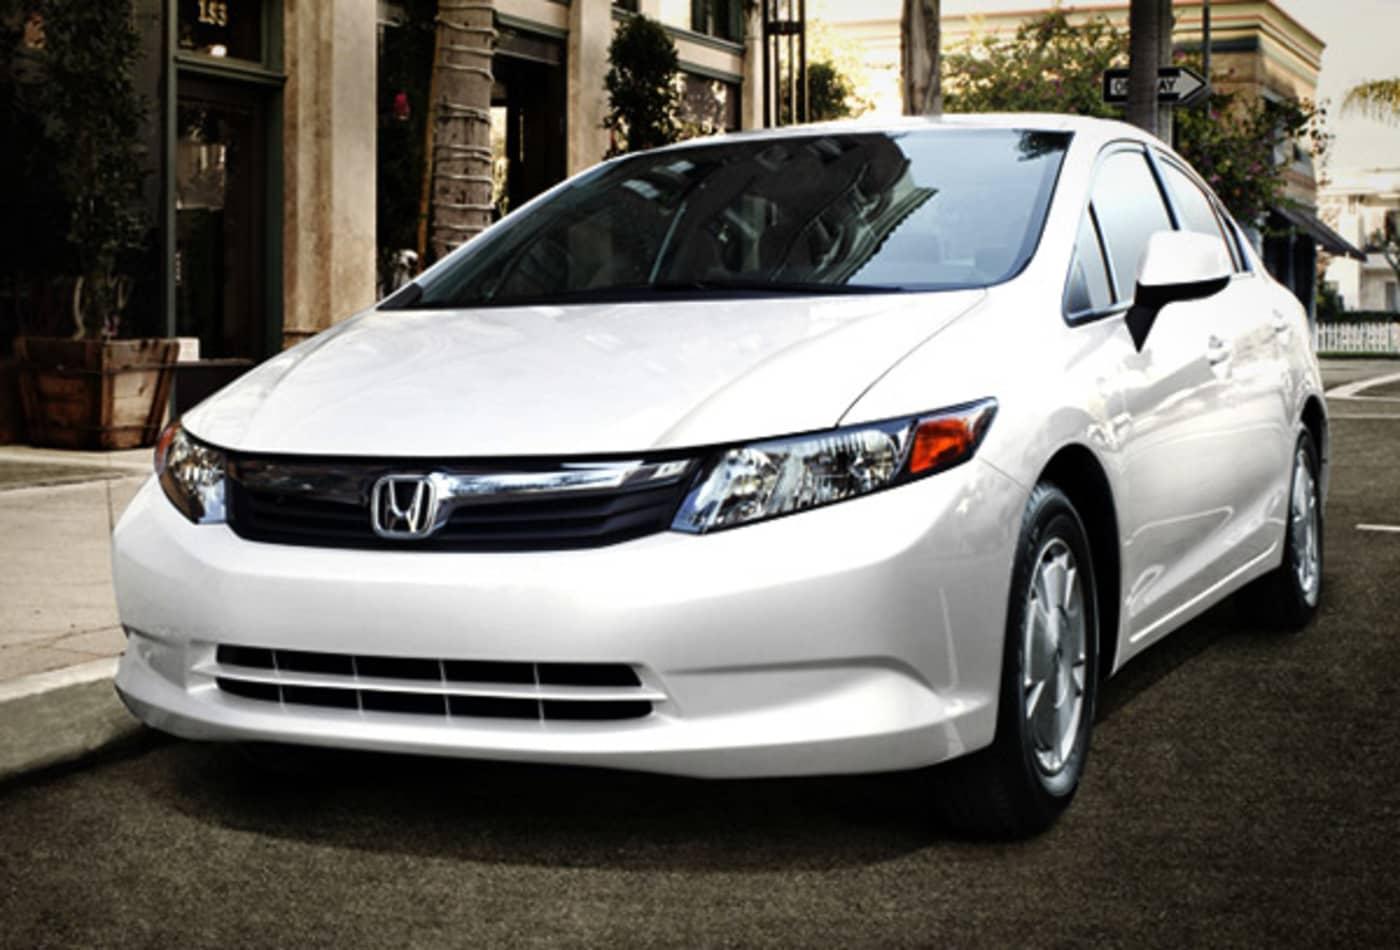 Honda-Civic-Best-Cars-Commuting-CNBC.jpg